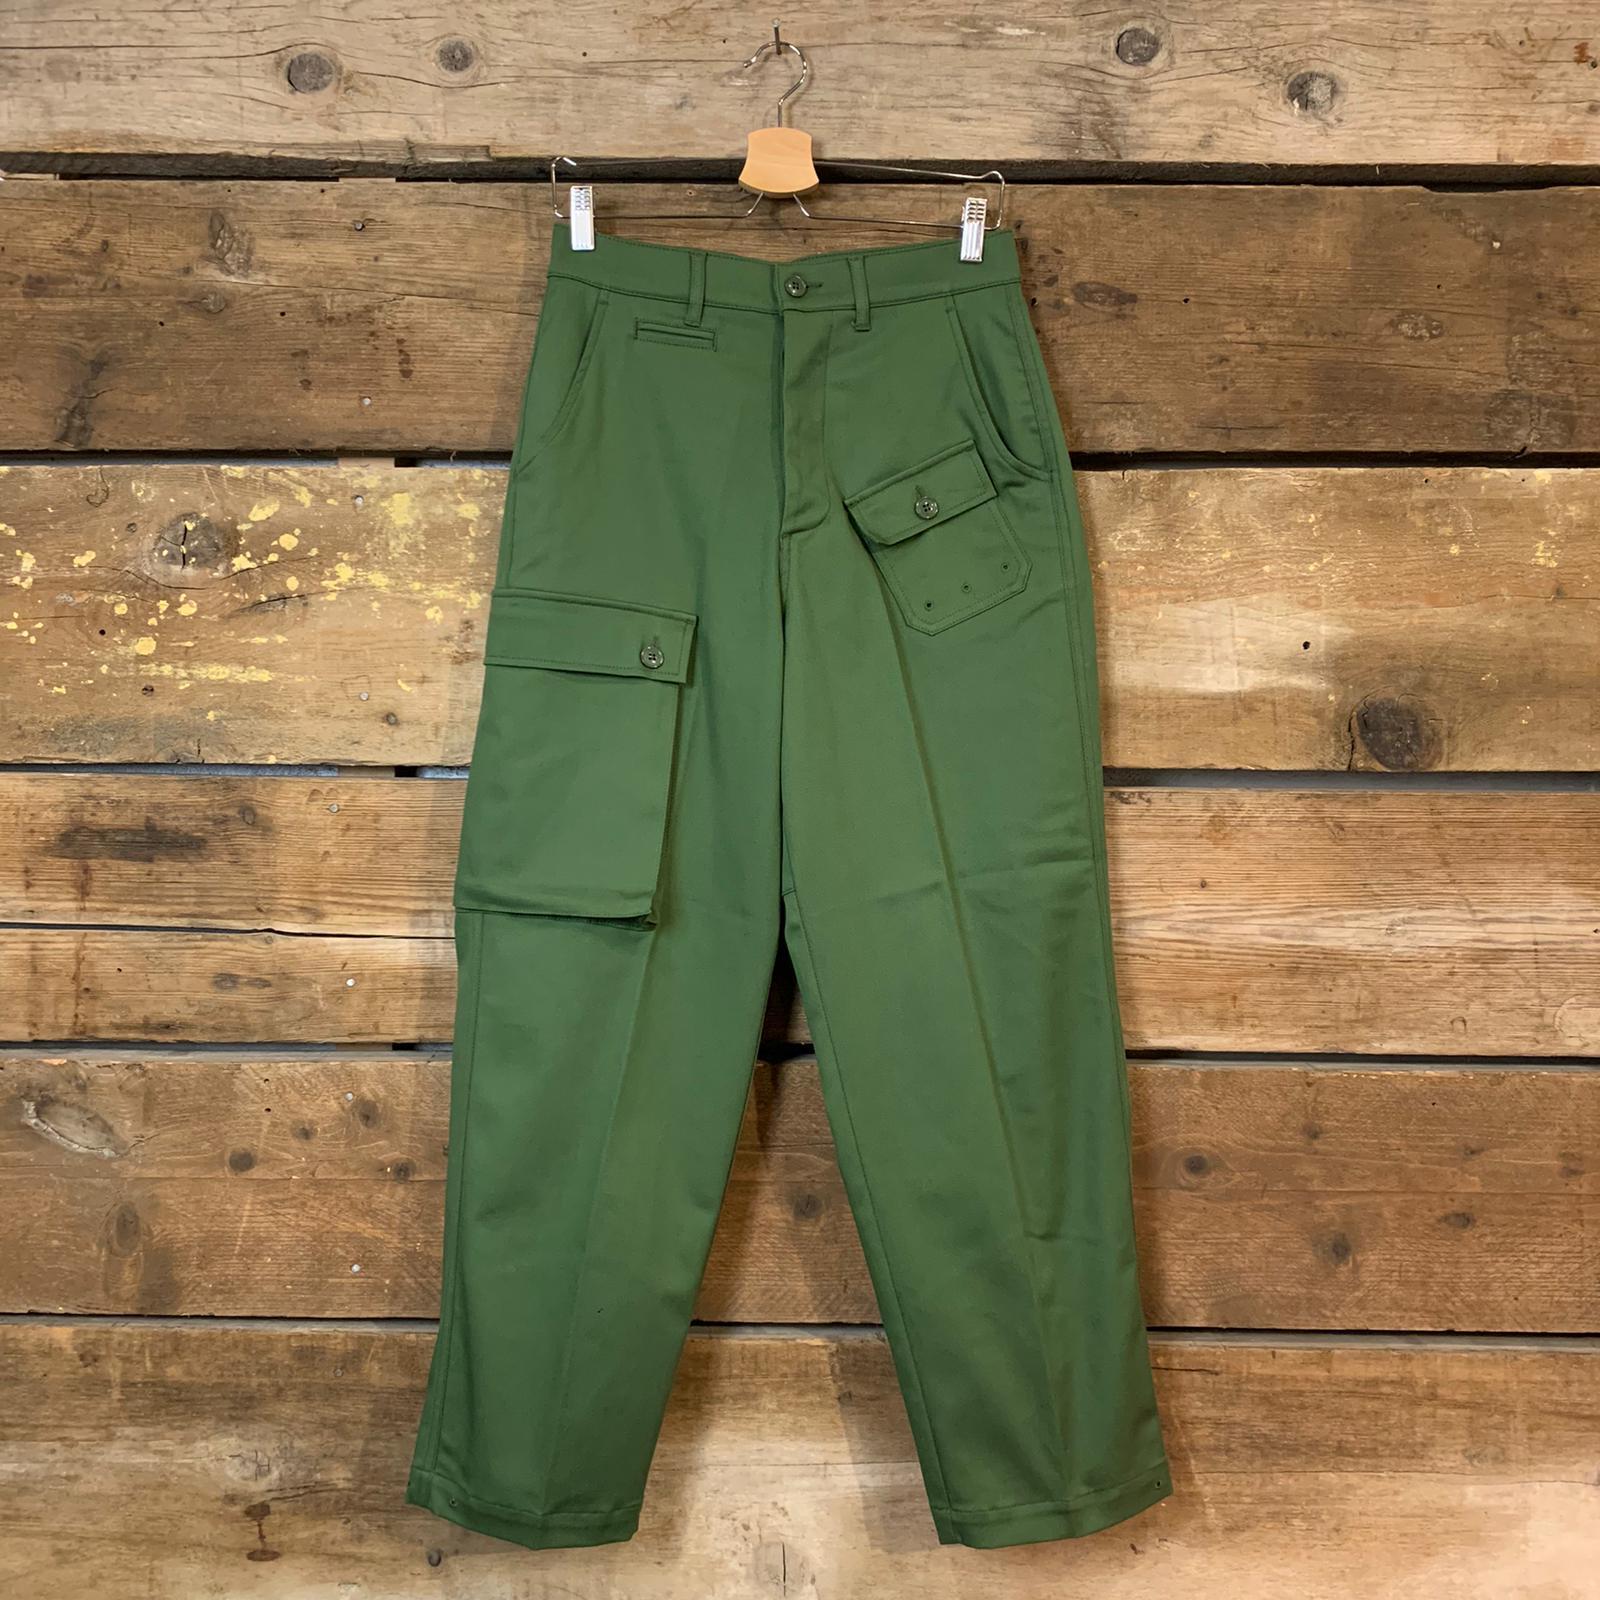 Pantalone Donna Department 5 Cargi con Tasconi Verde Militare